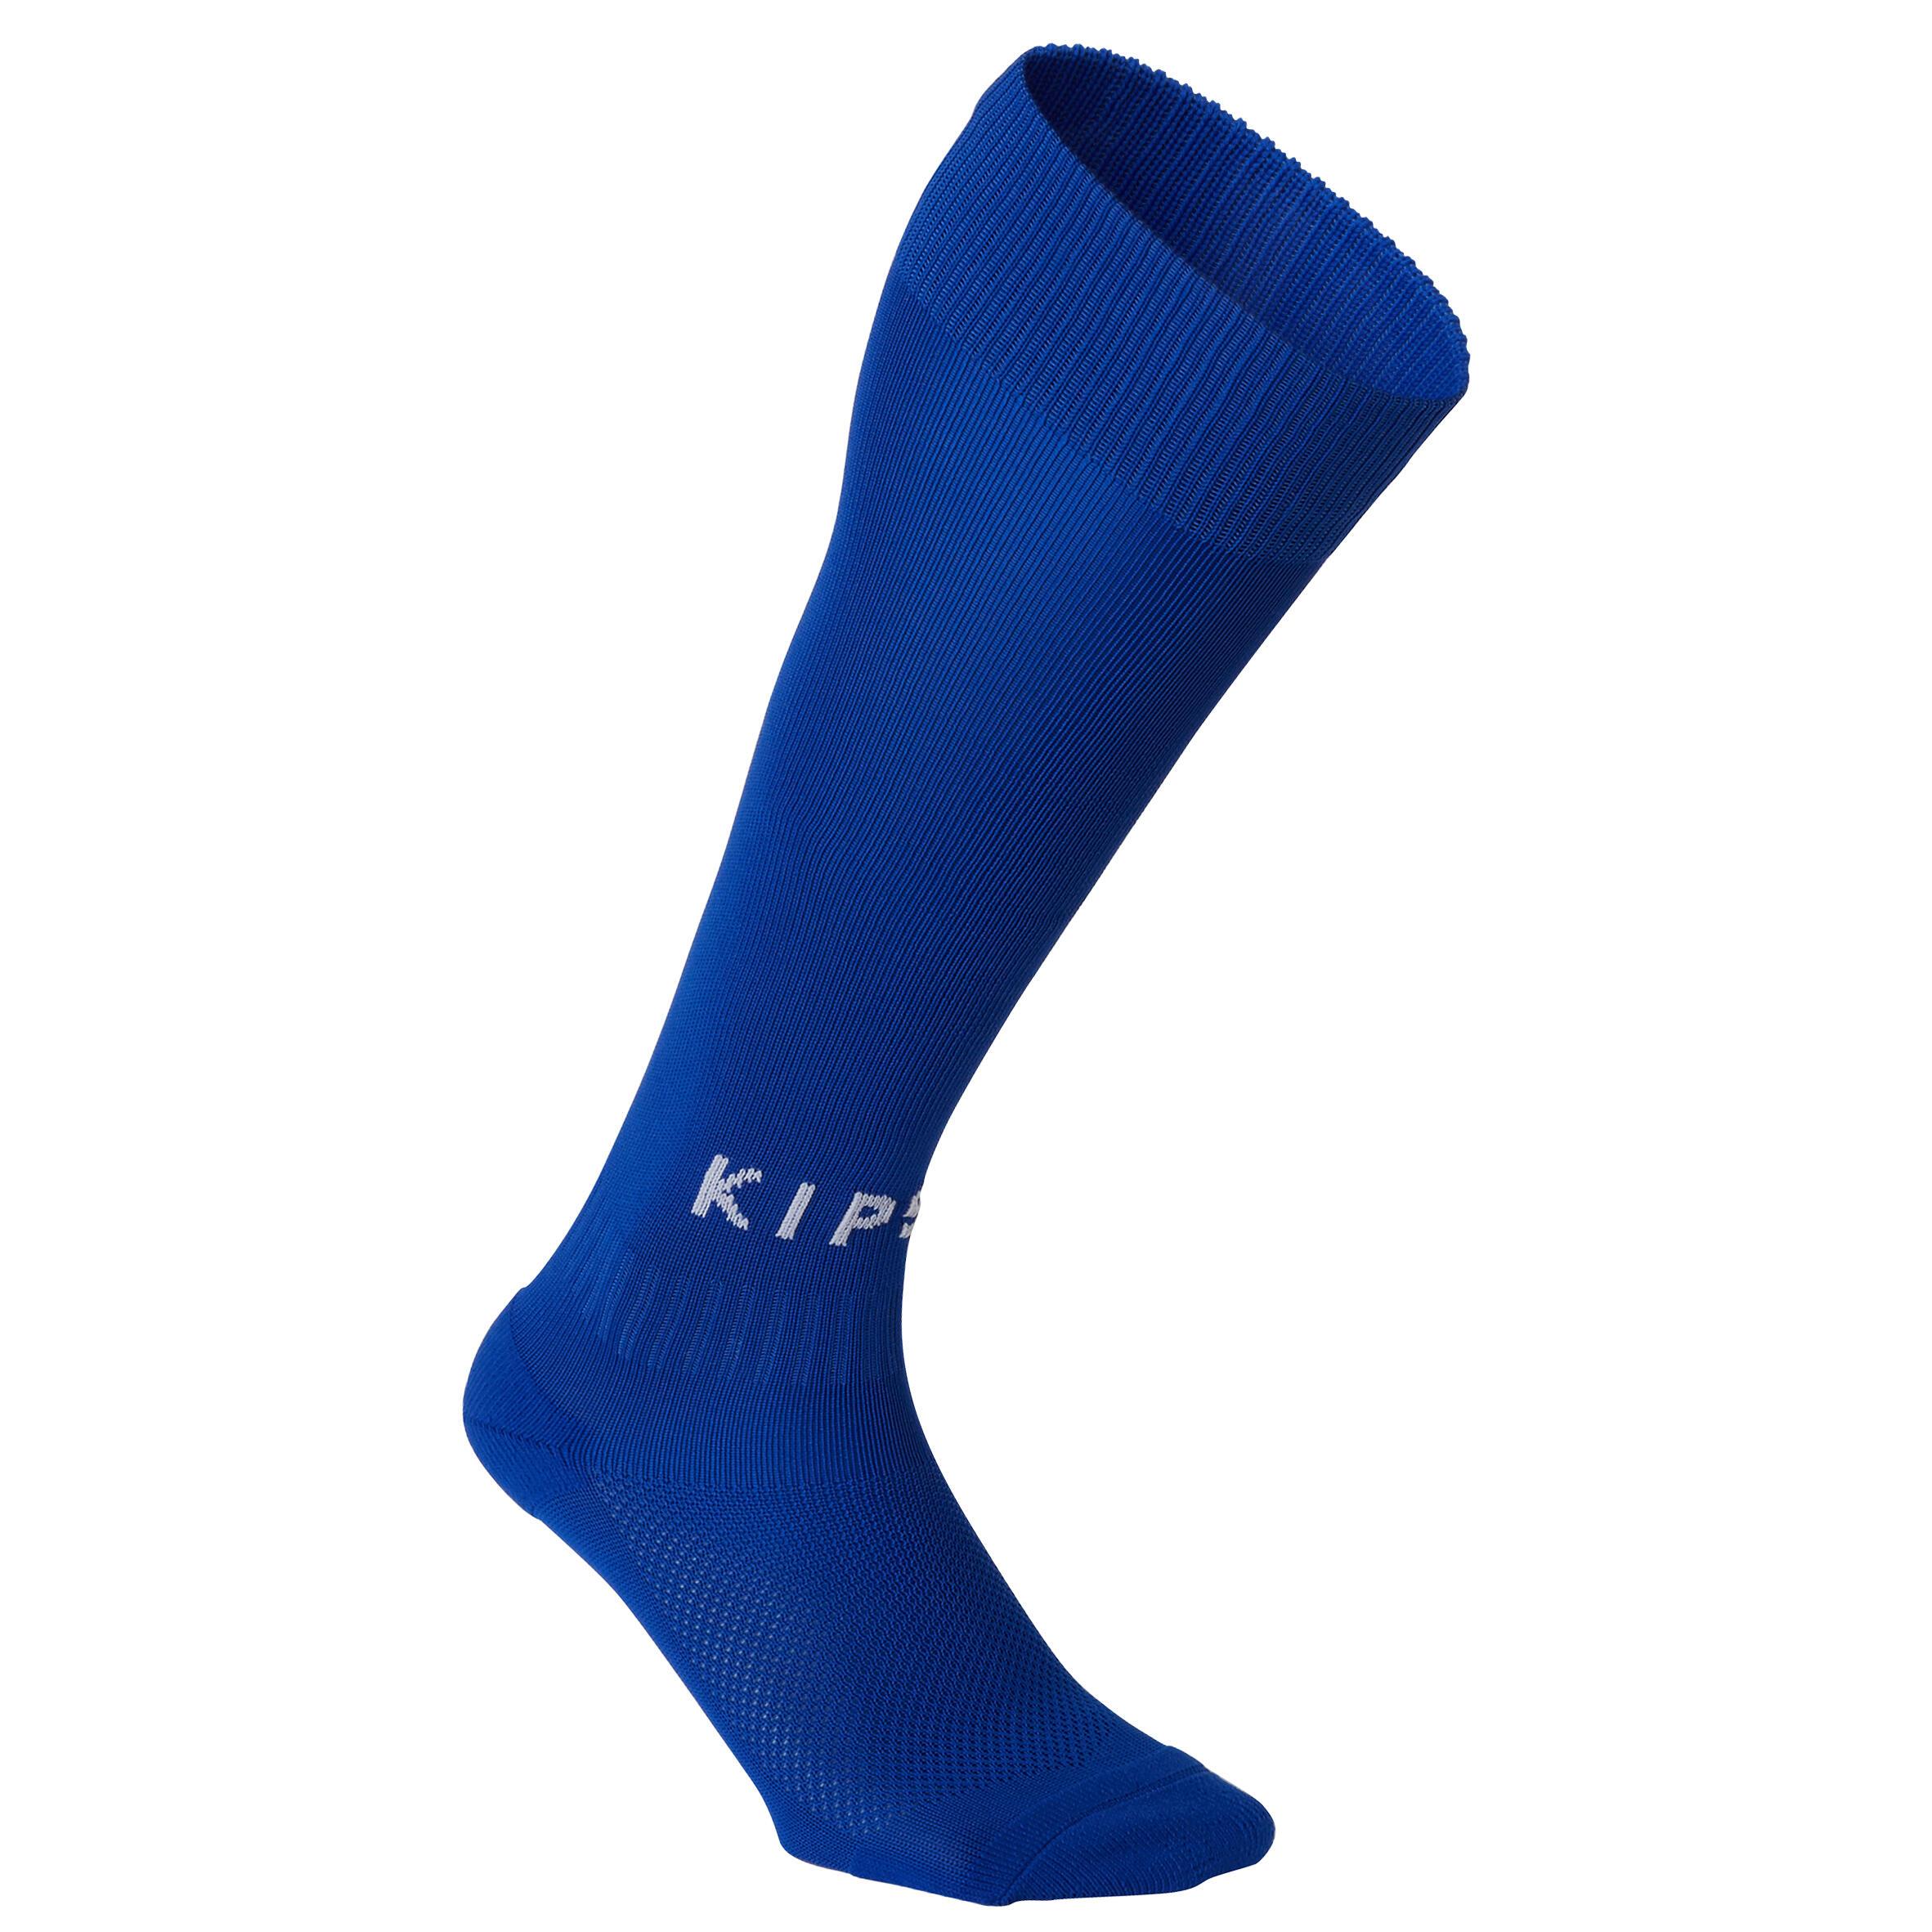 Kipsta Voetbalsokken / voetbalkousen kind F100 blauw